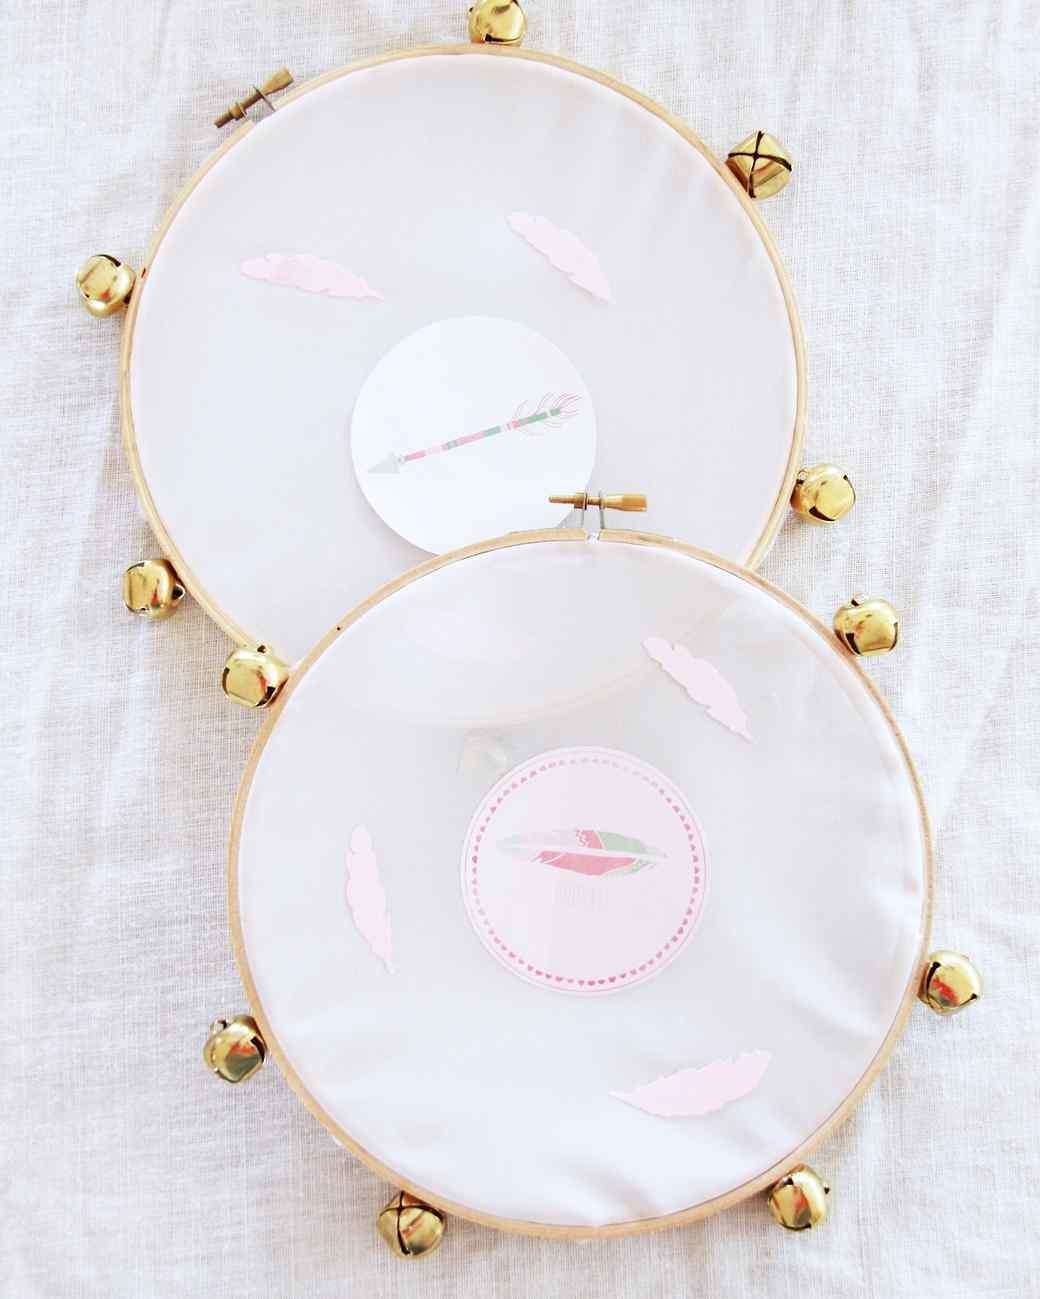 embroidery hoop tambourine